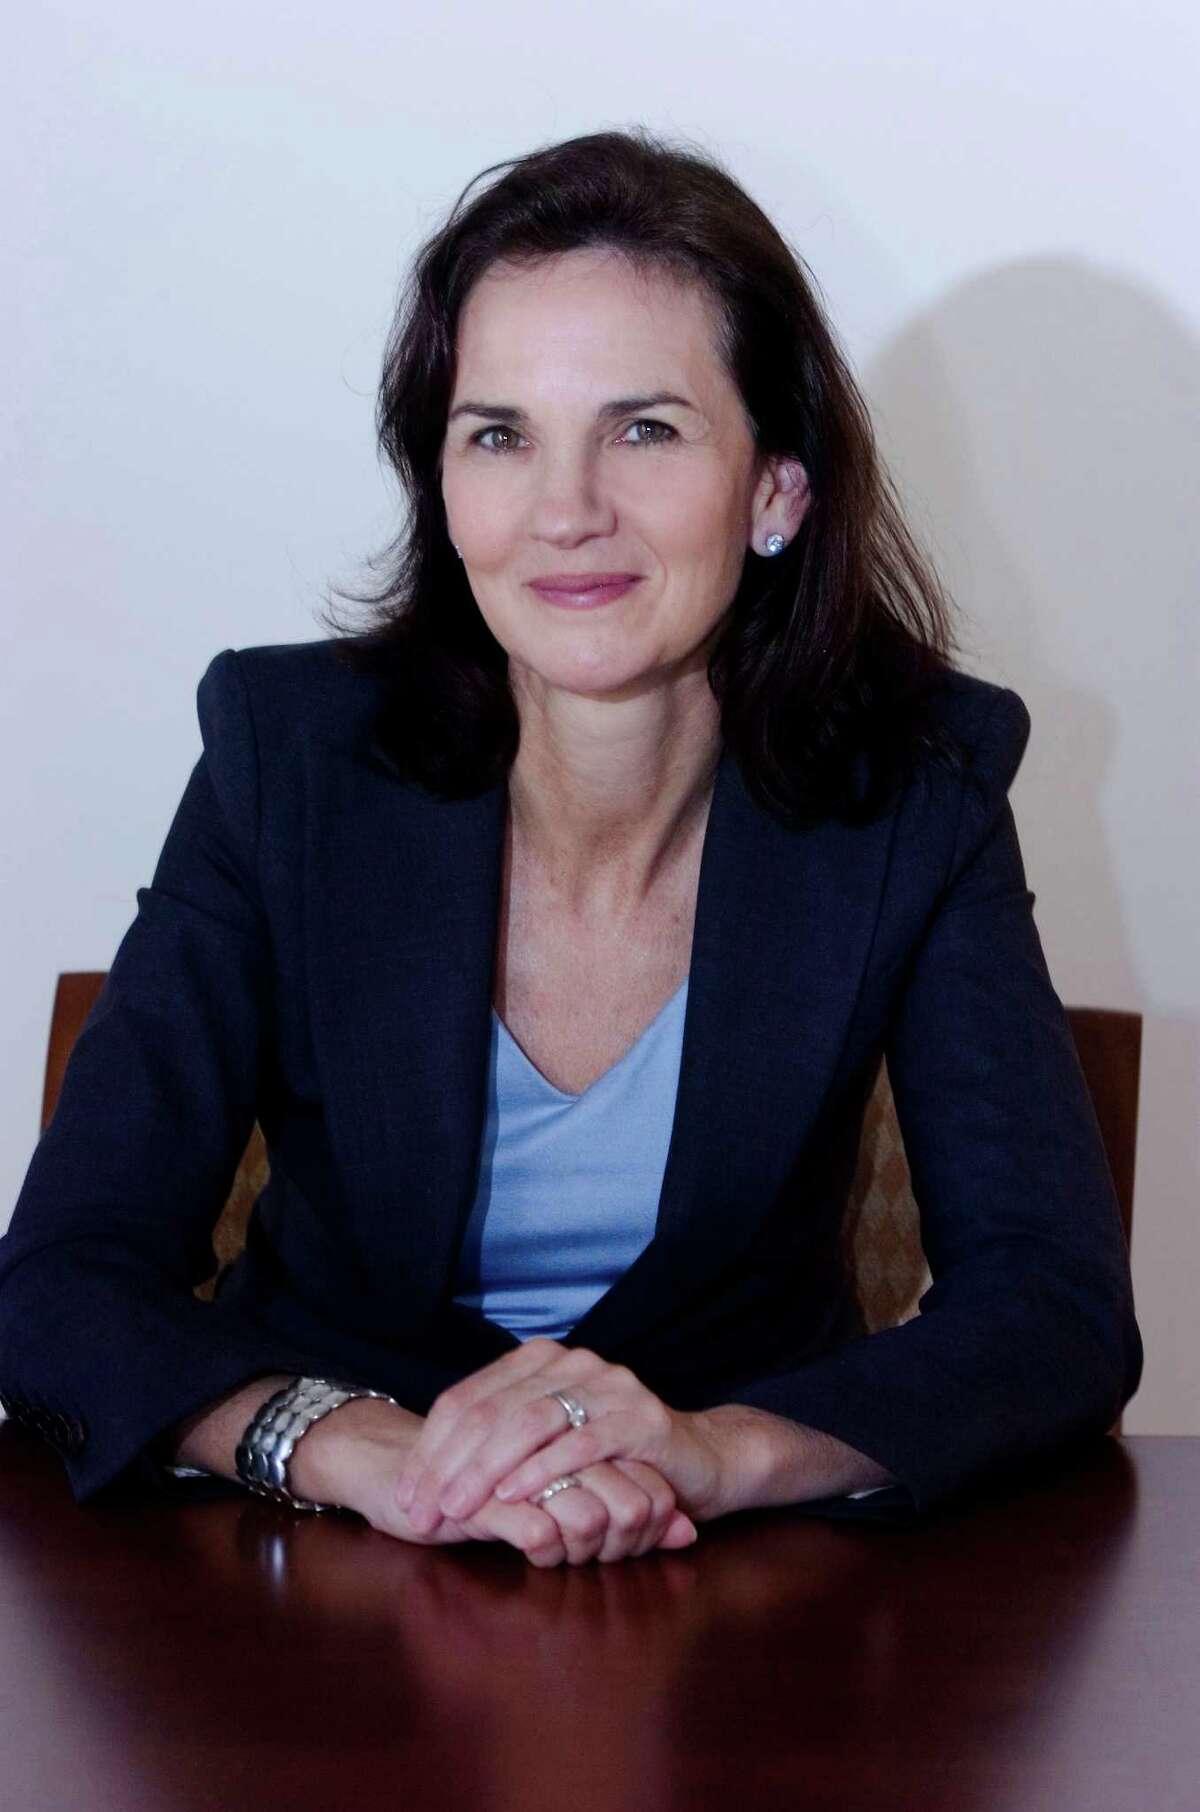 Acting U.S. Attorney Deirdre Daly